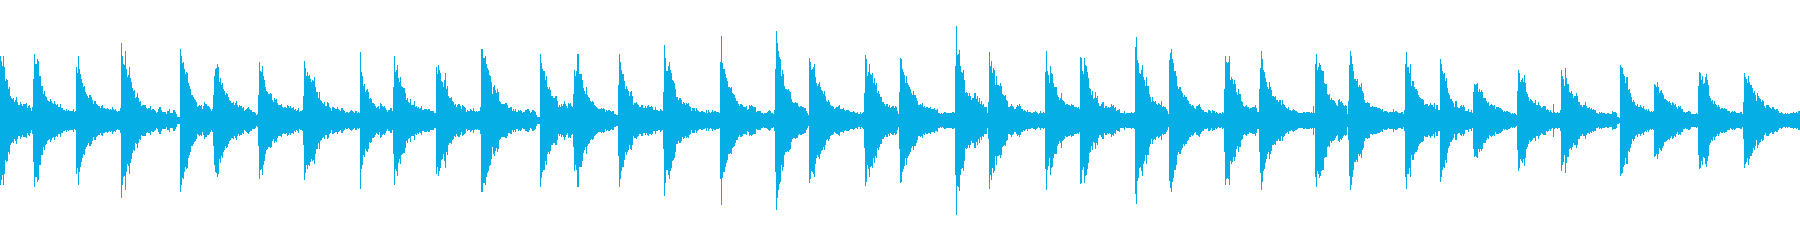 piano loop ピアノループ の再生済みの波形